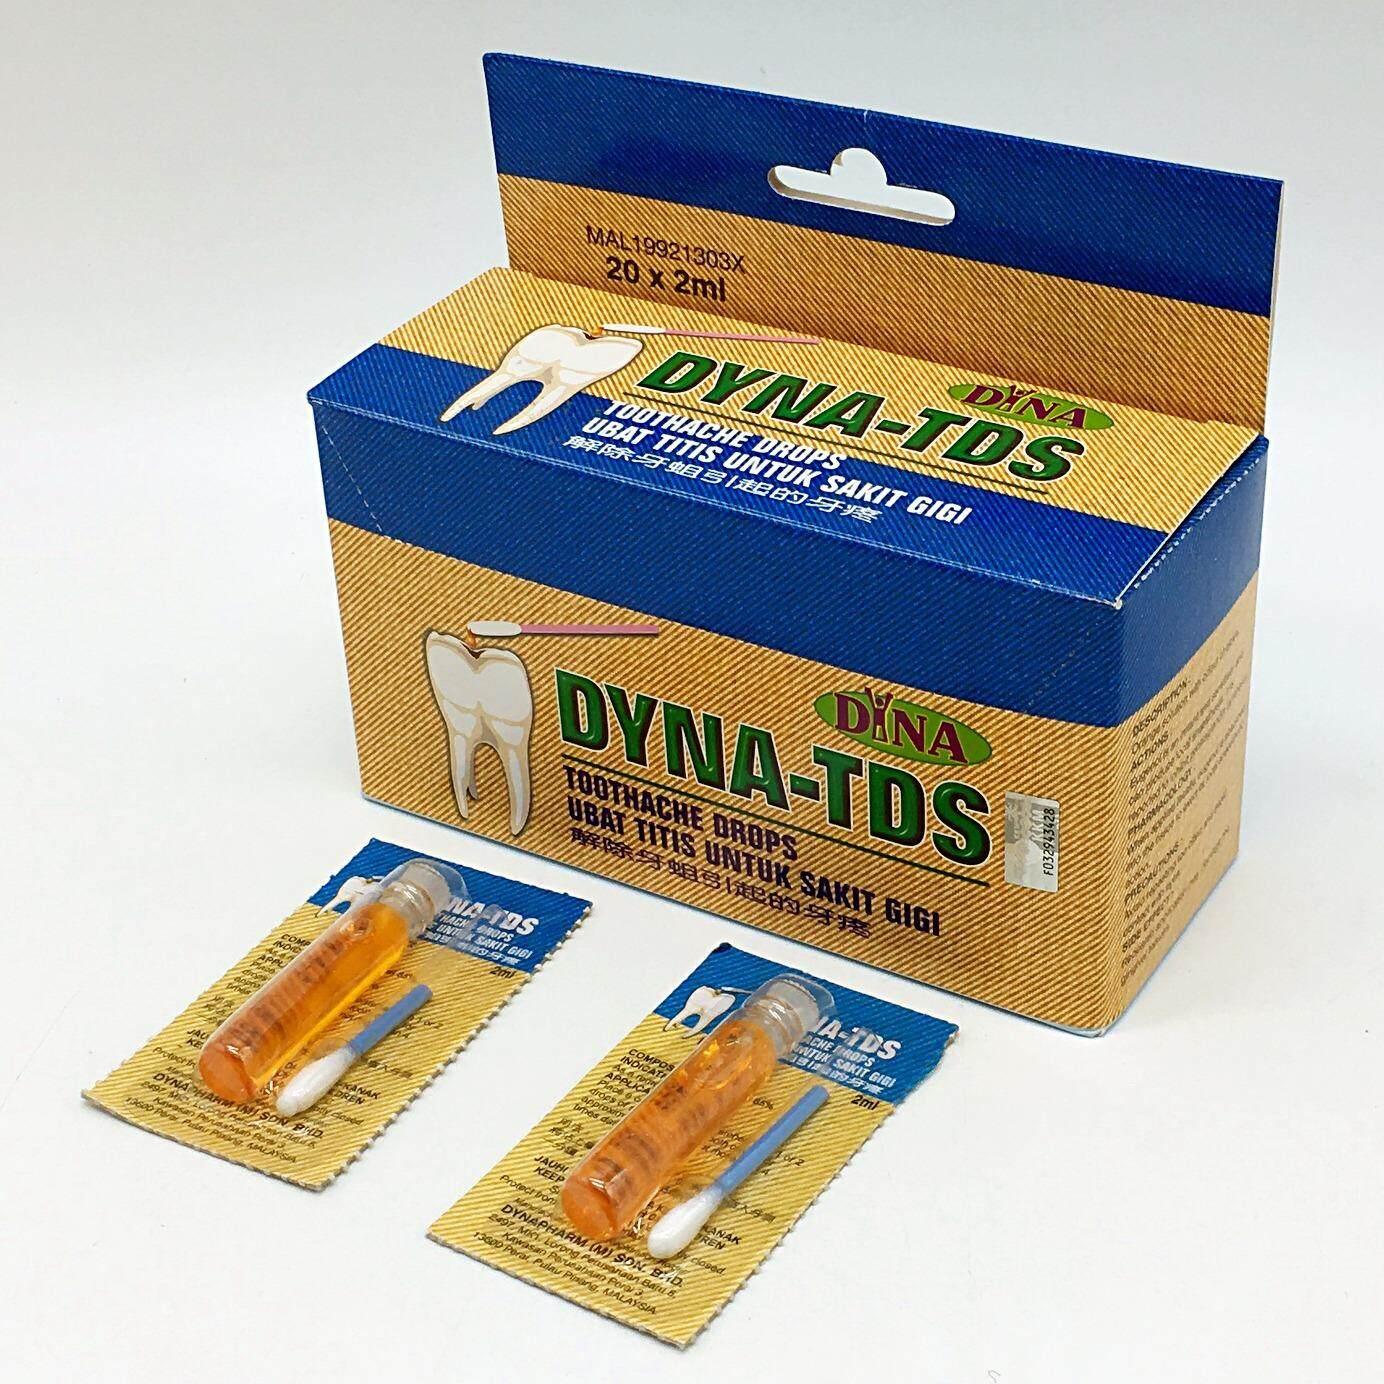 Features Tooth Pain Set Hurix Kapsul 6s Hurixs Toothache Drop 2ml Tongkat Arab Dyna Drops 2 Ml X 3 Pcs